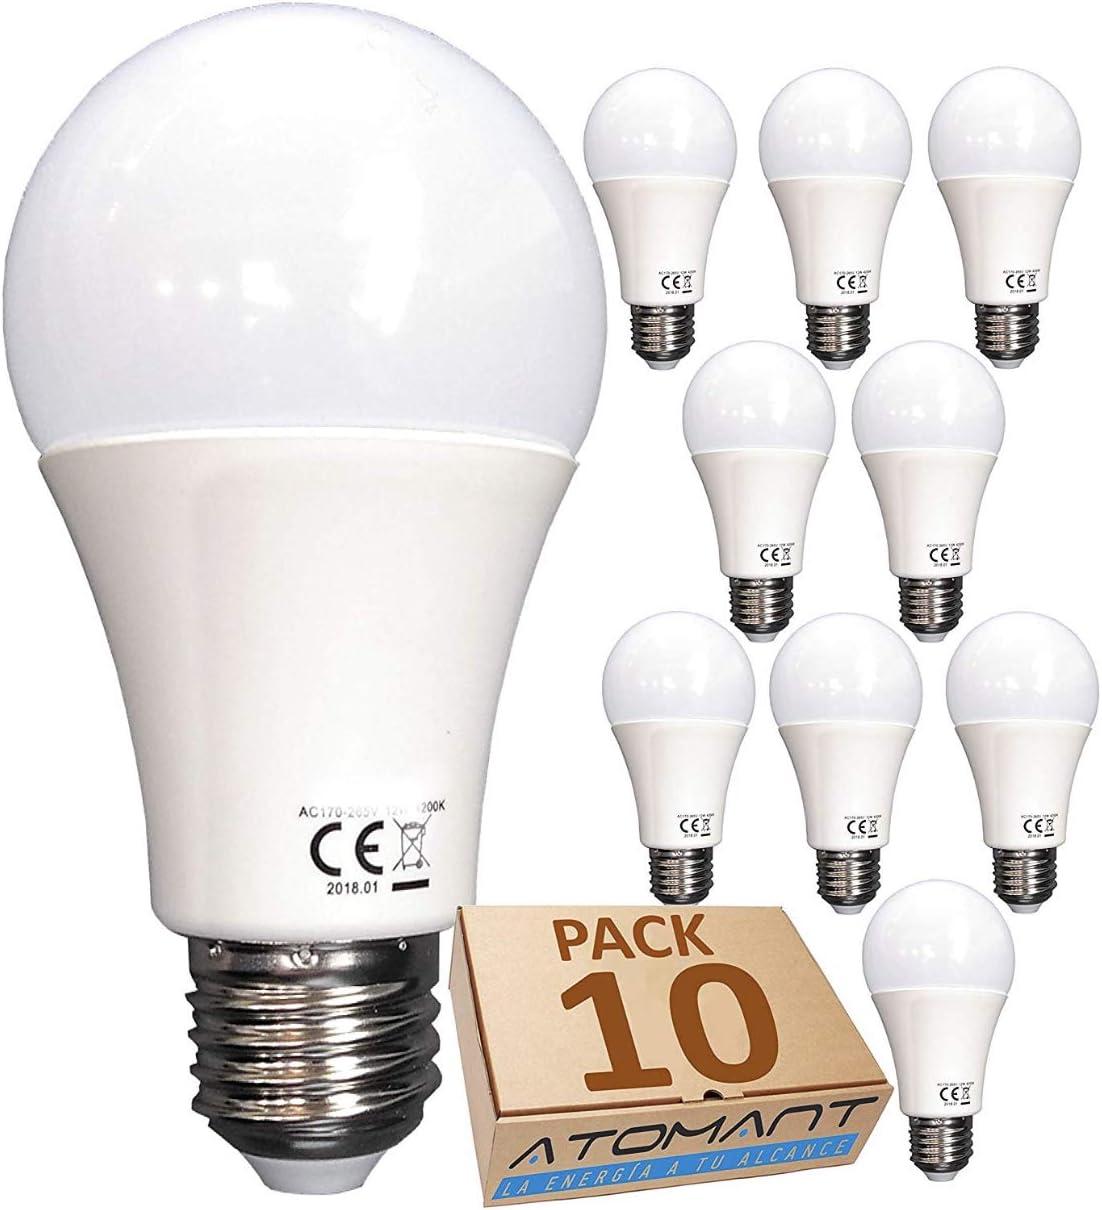 Pack 10x Bombilla LED A60, 12w. Color Blanco Frio (6500K). 1120 Lumenes Equivalencia 100w, no Regulable. A++